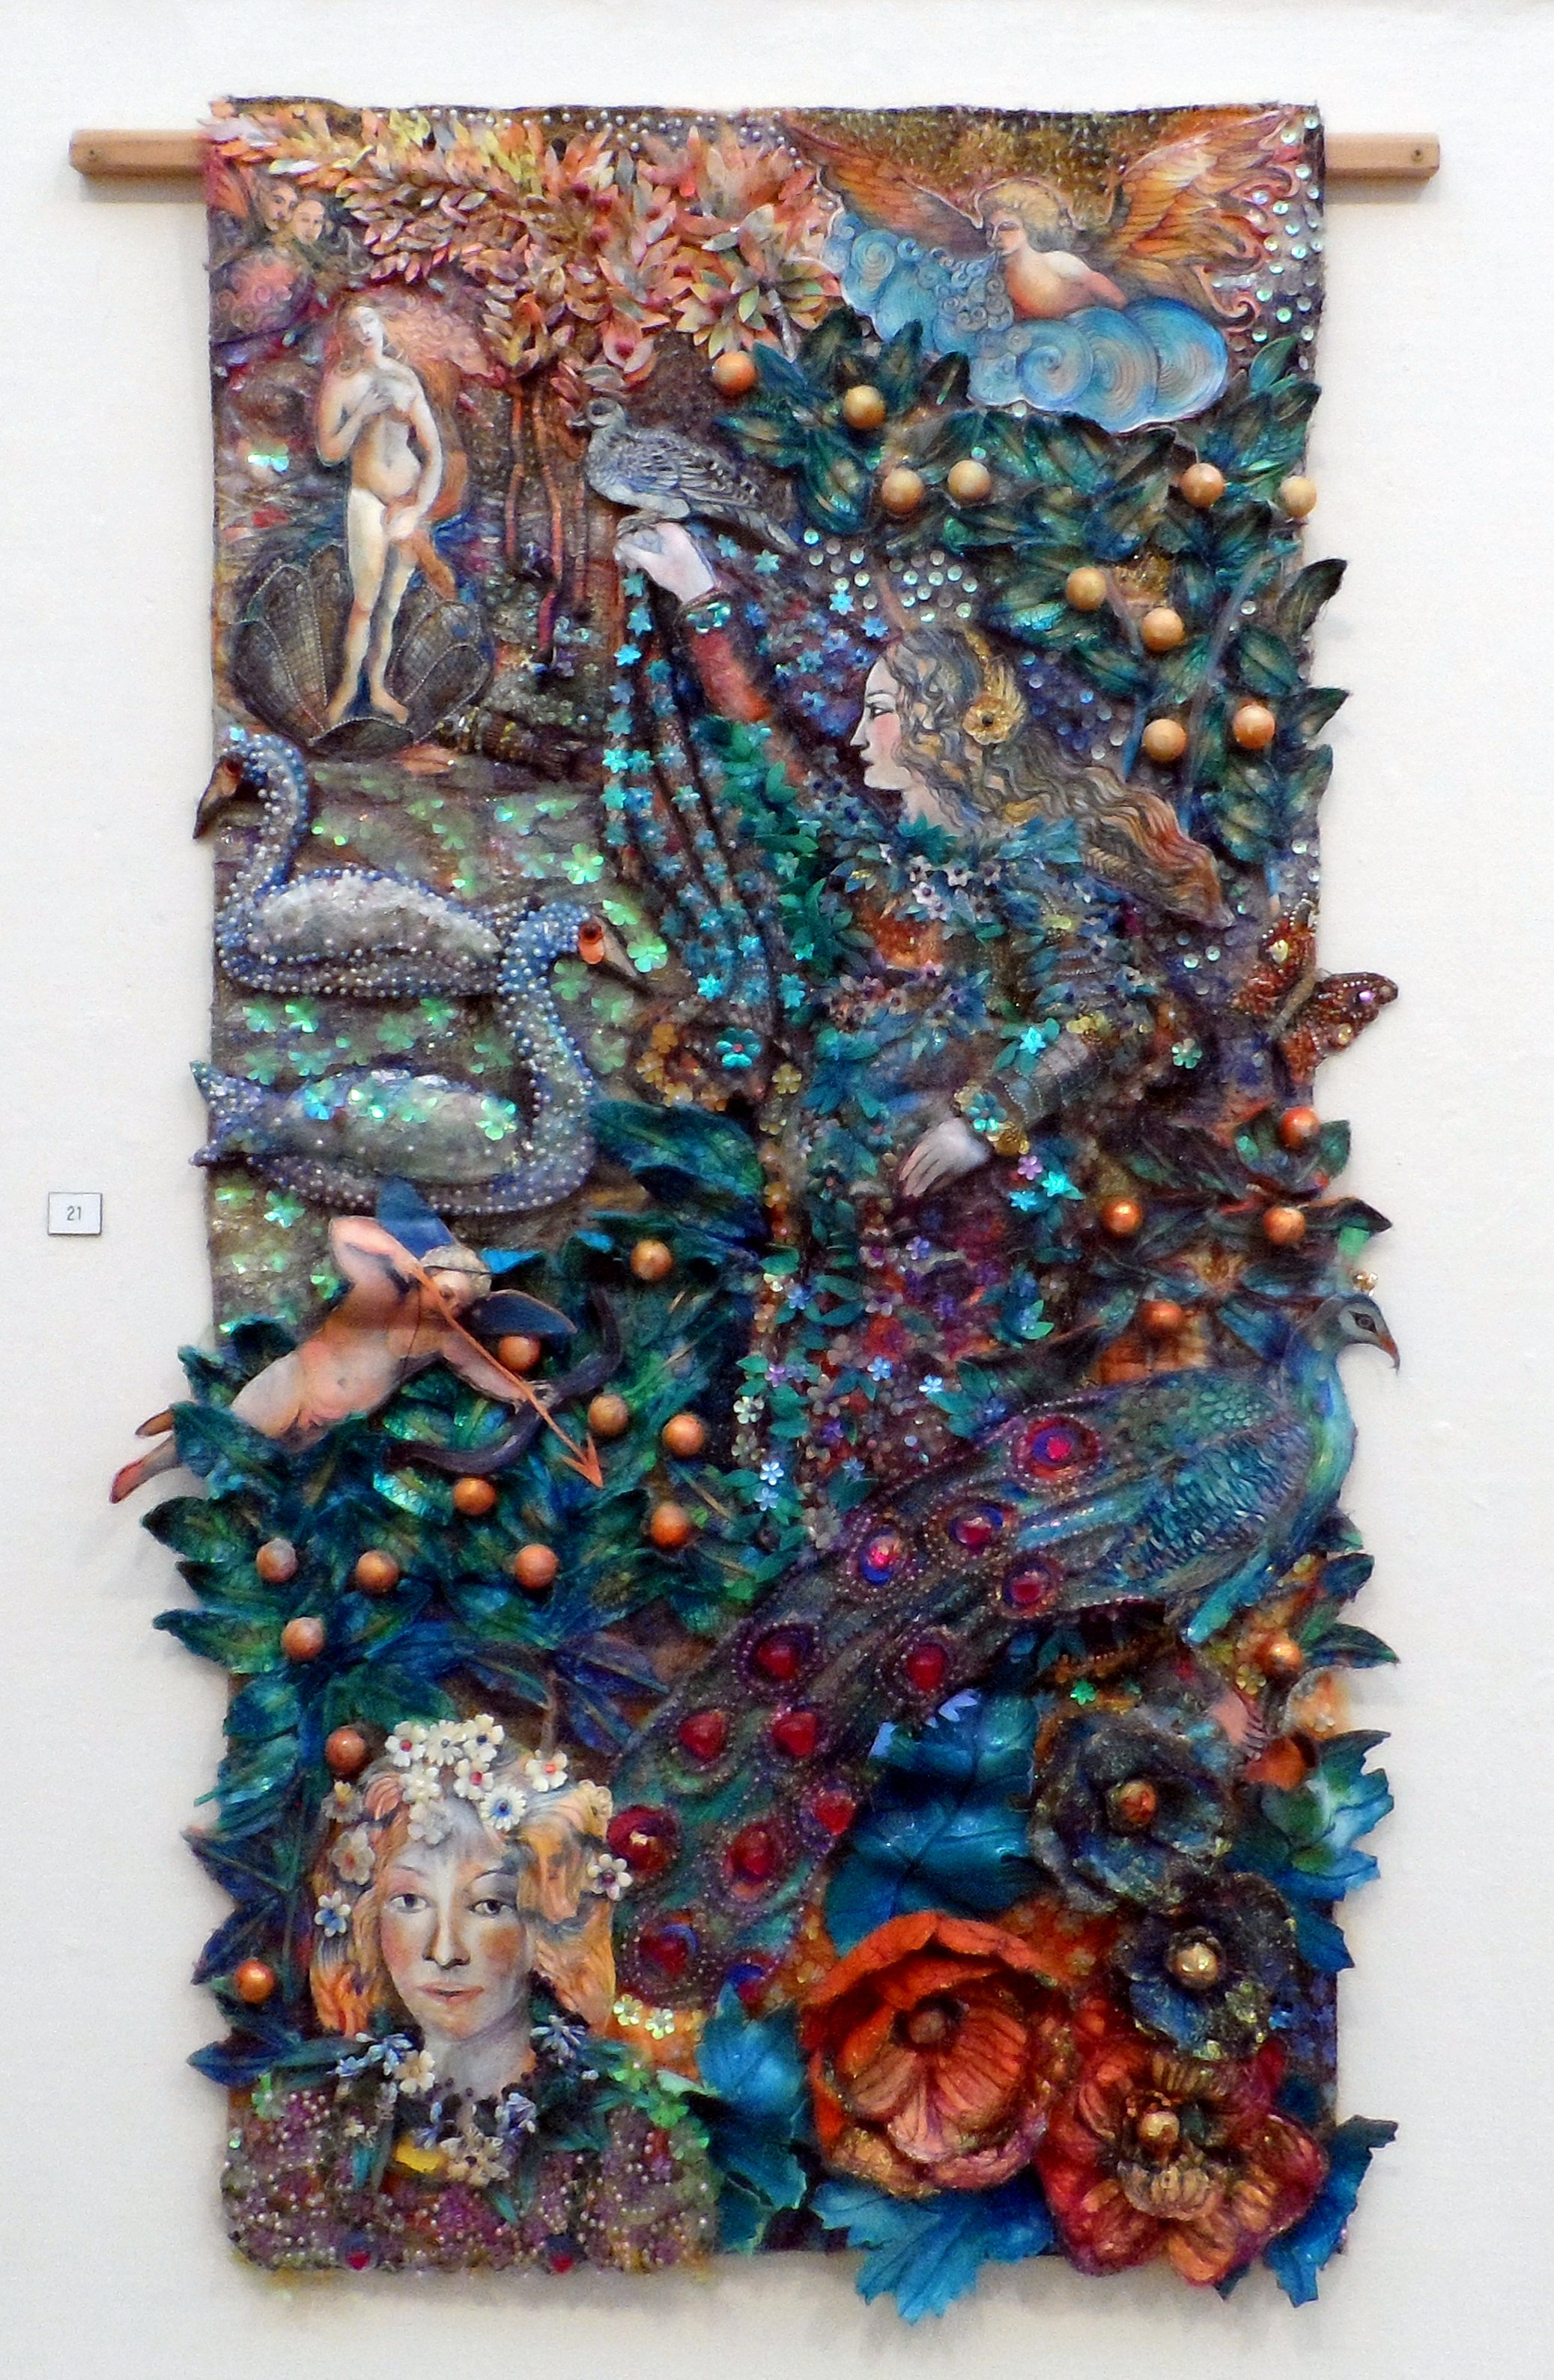 BOTTICELLI QUILT by Nikki Parmenter, Williamson Gallery, 2019